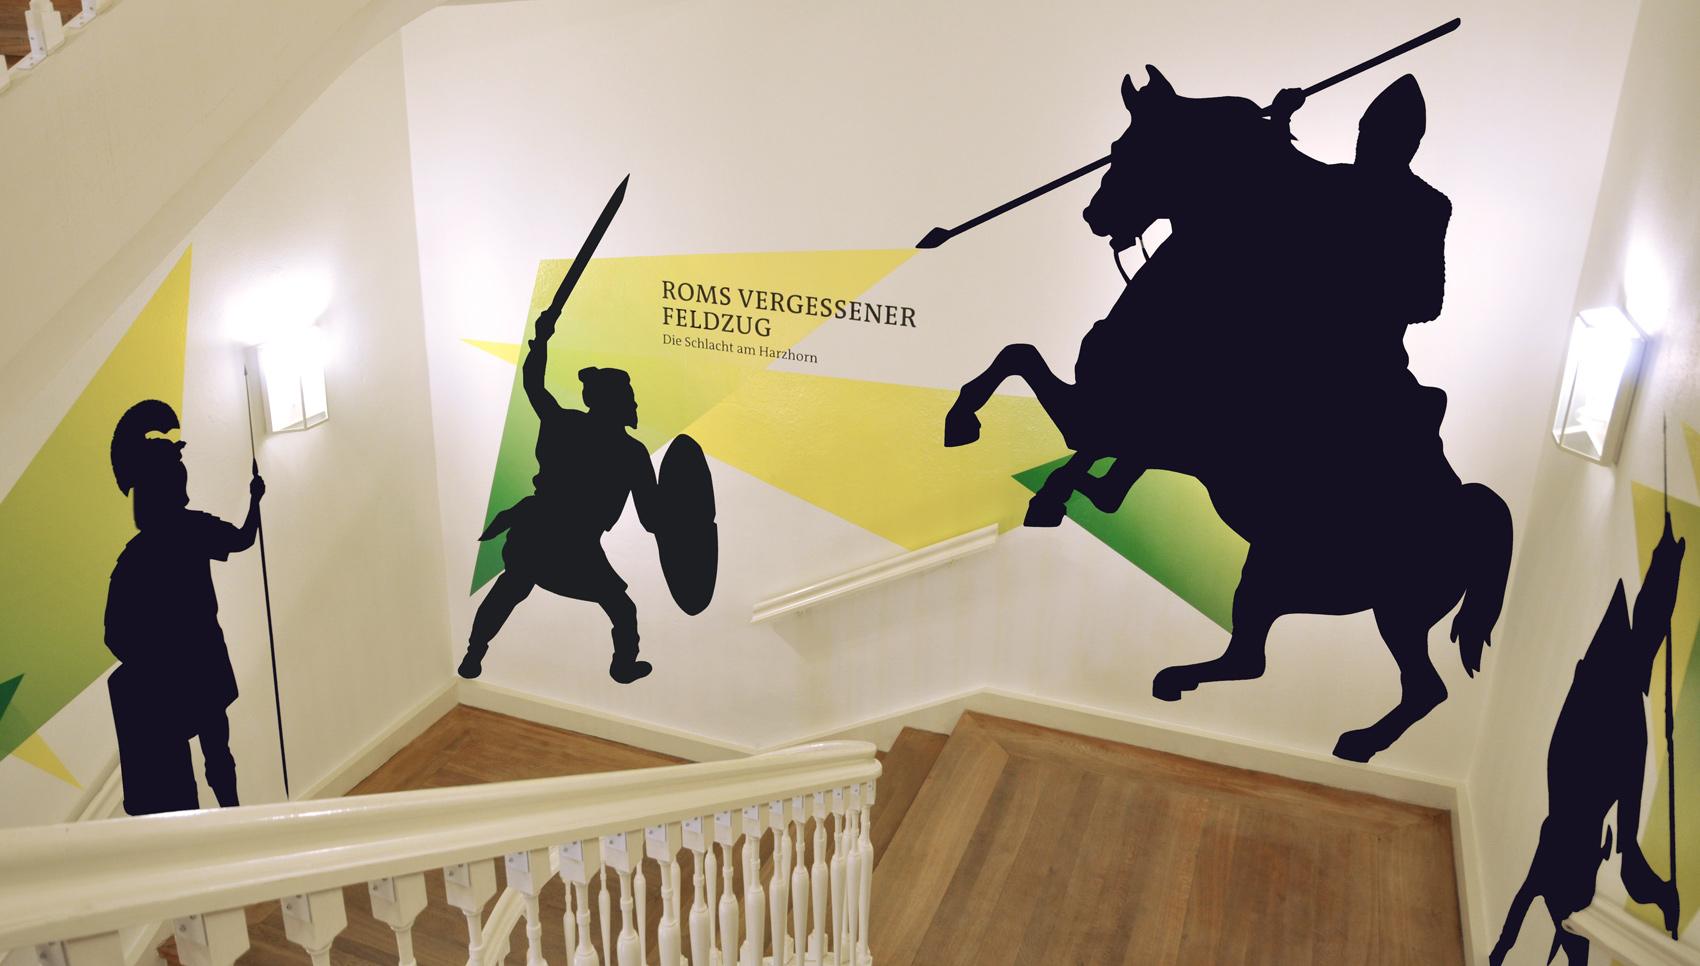 Roms vergessener Feldzug. Ausstellungsgestaltung.